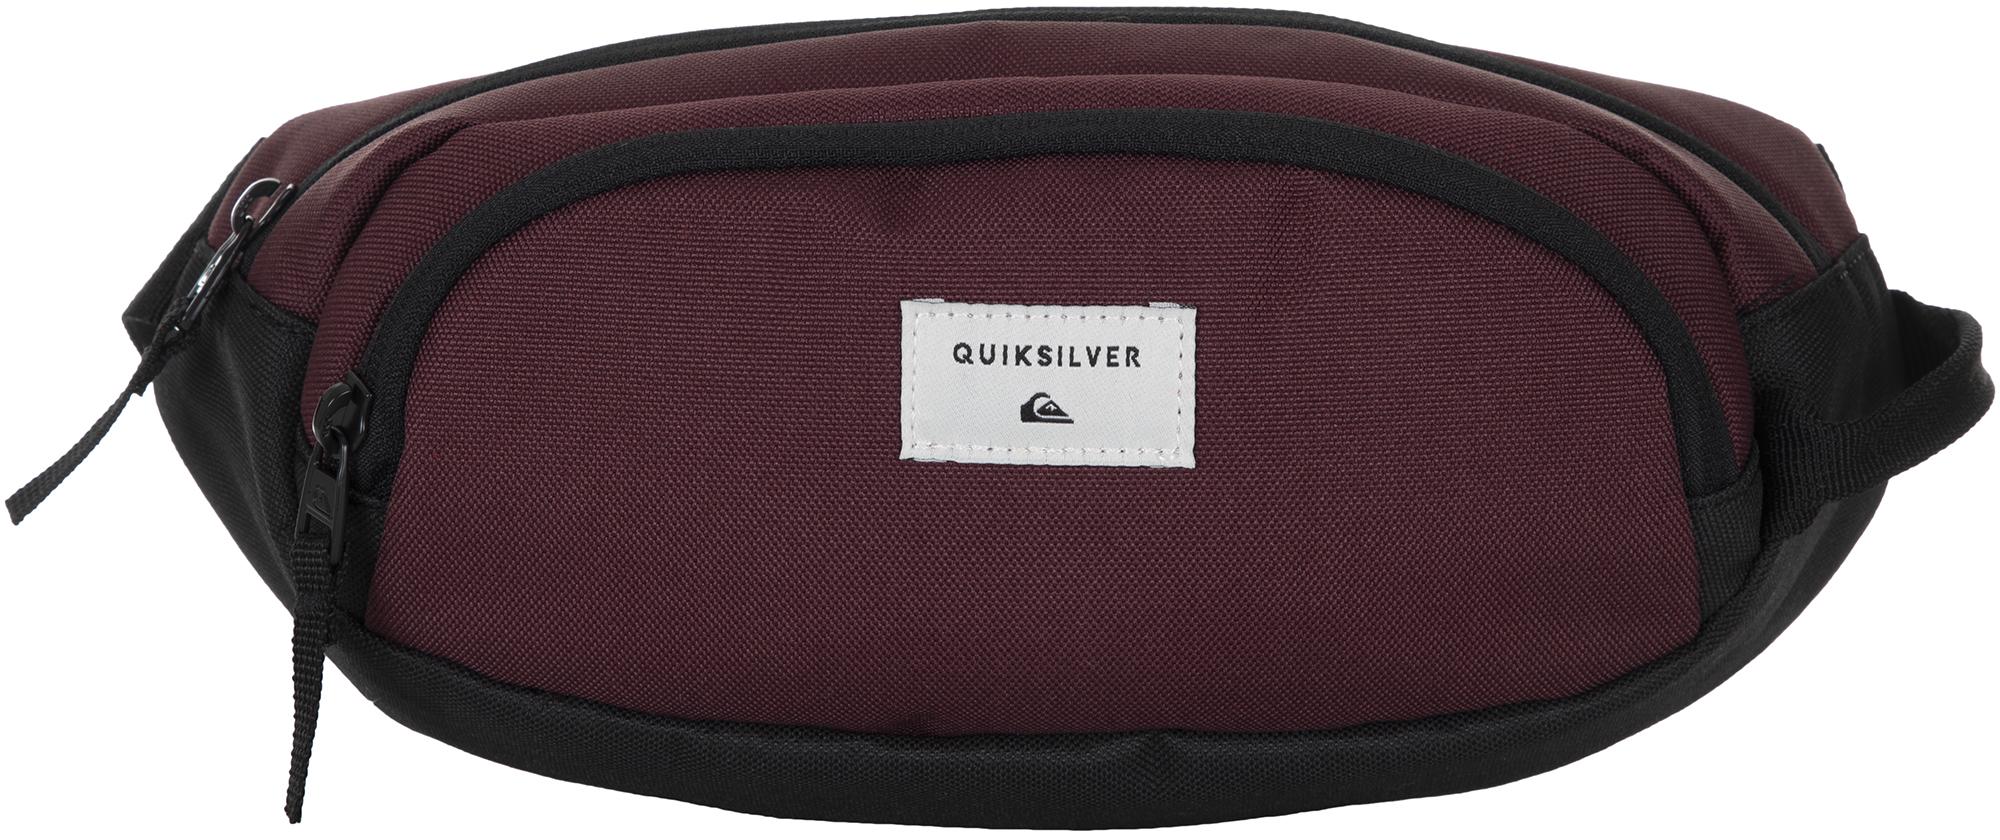 Quiksilver Сумка на пояс Quiksilver Smugglet цена